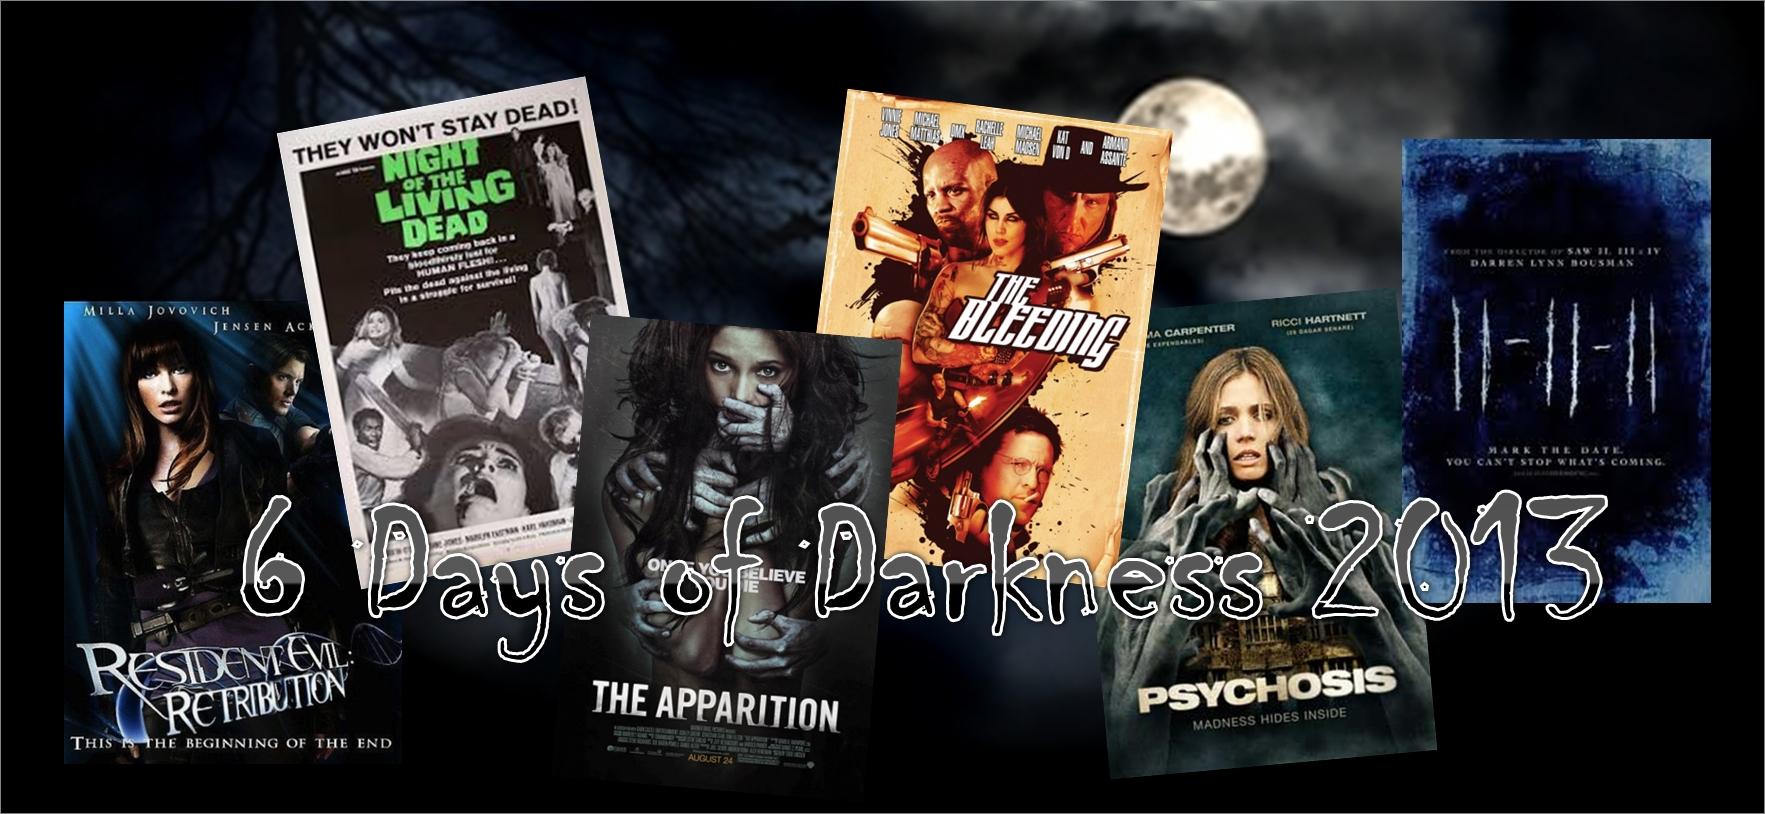 6 Days of Darkness 2013